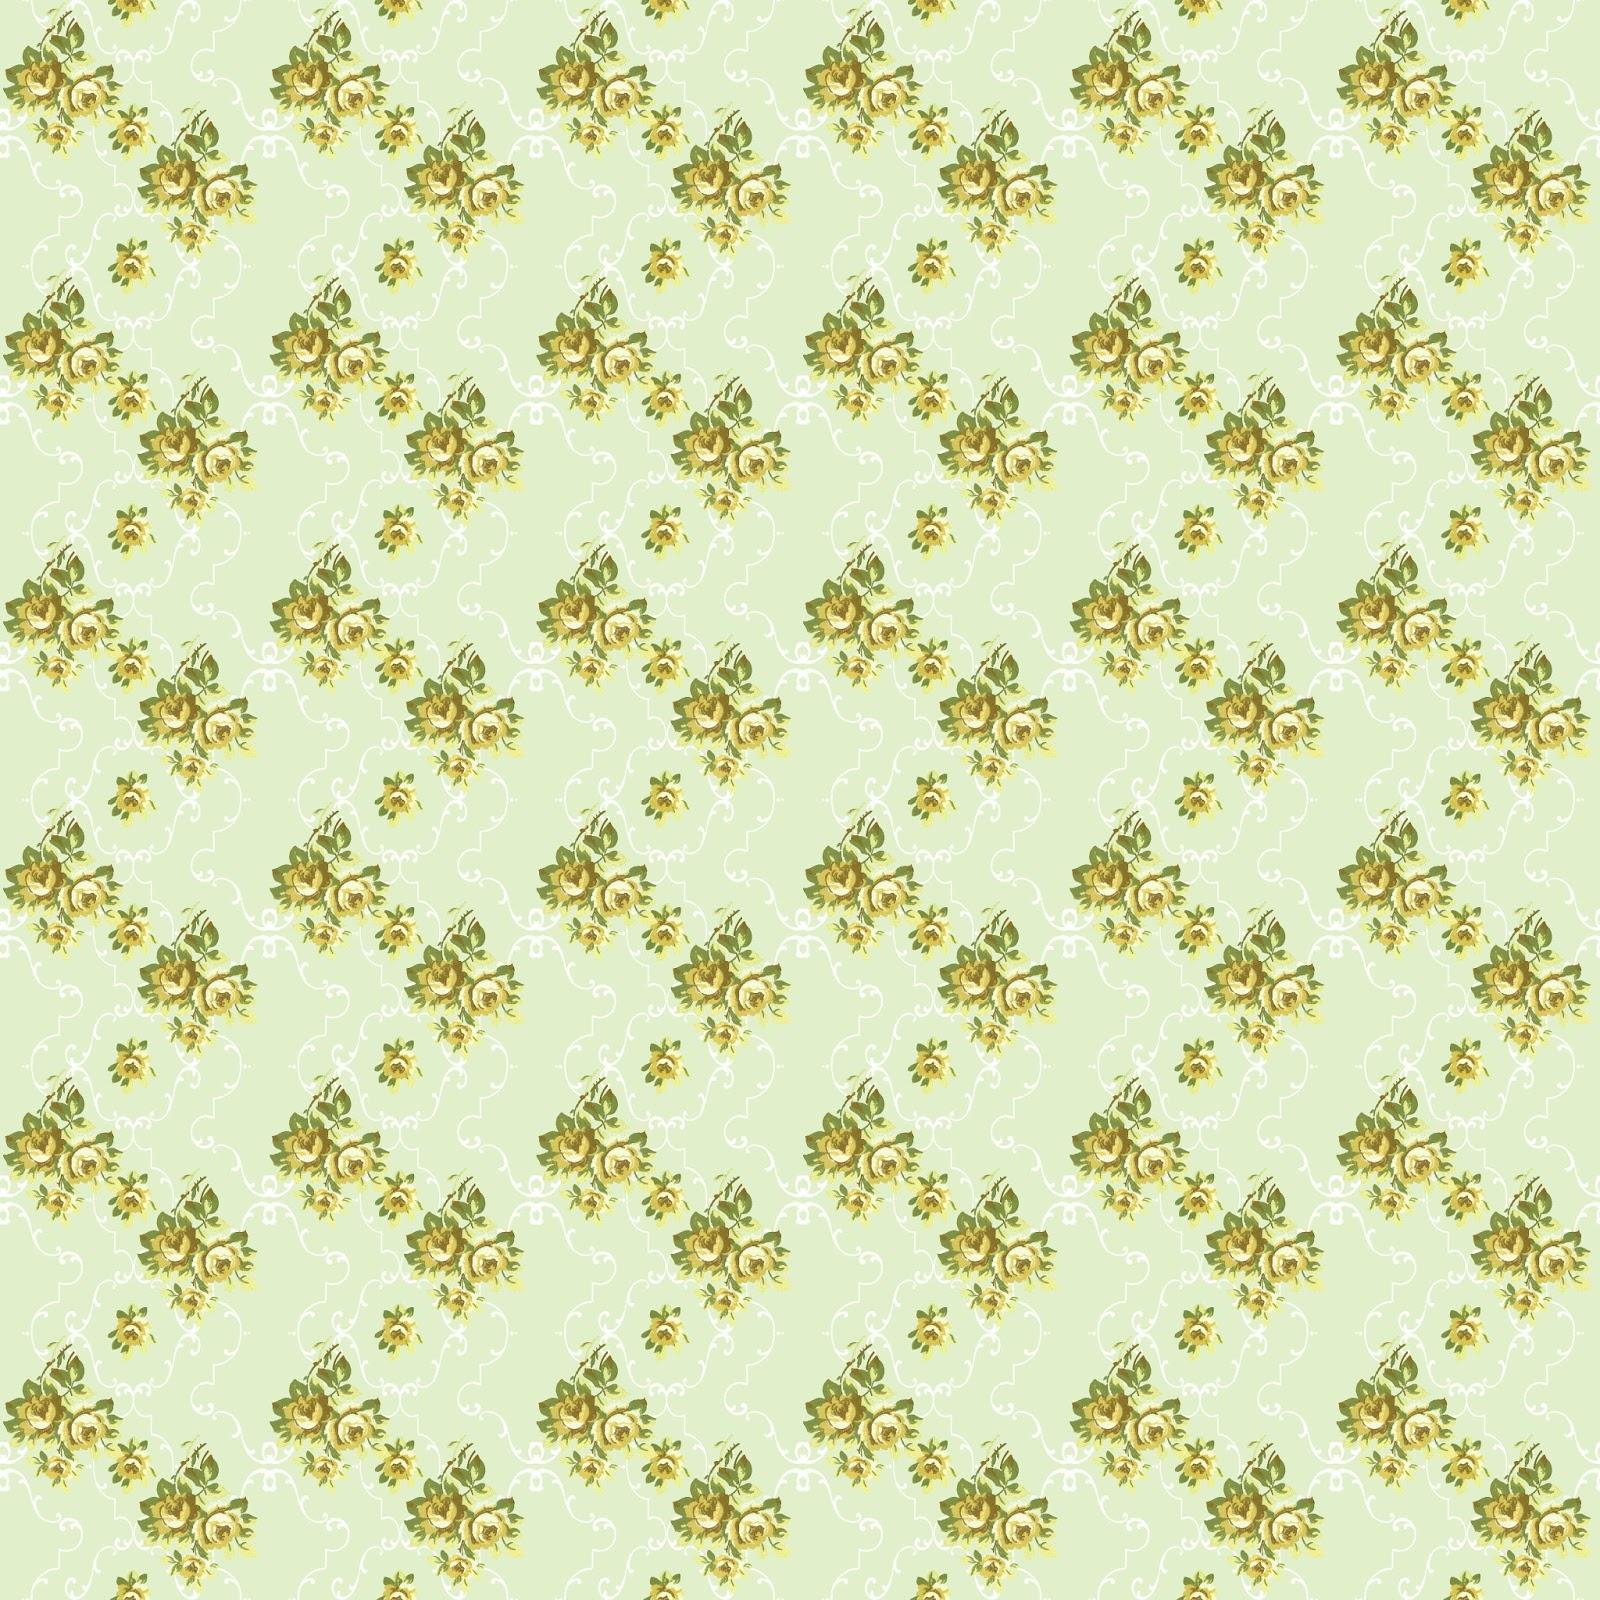 Scrapbook paper download - Flower Rose Digital Paper Download Image